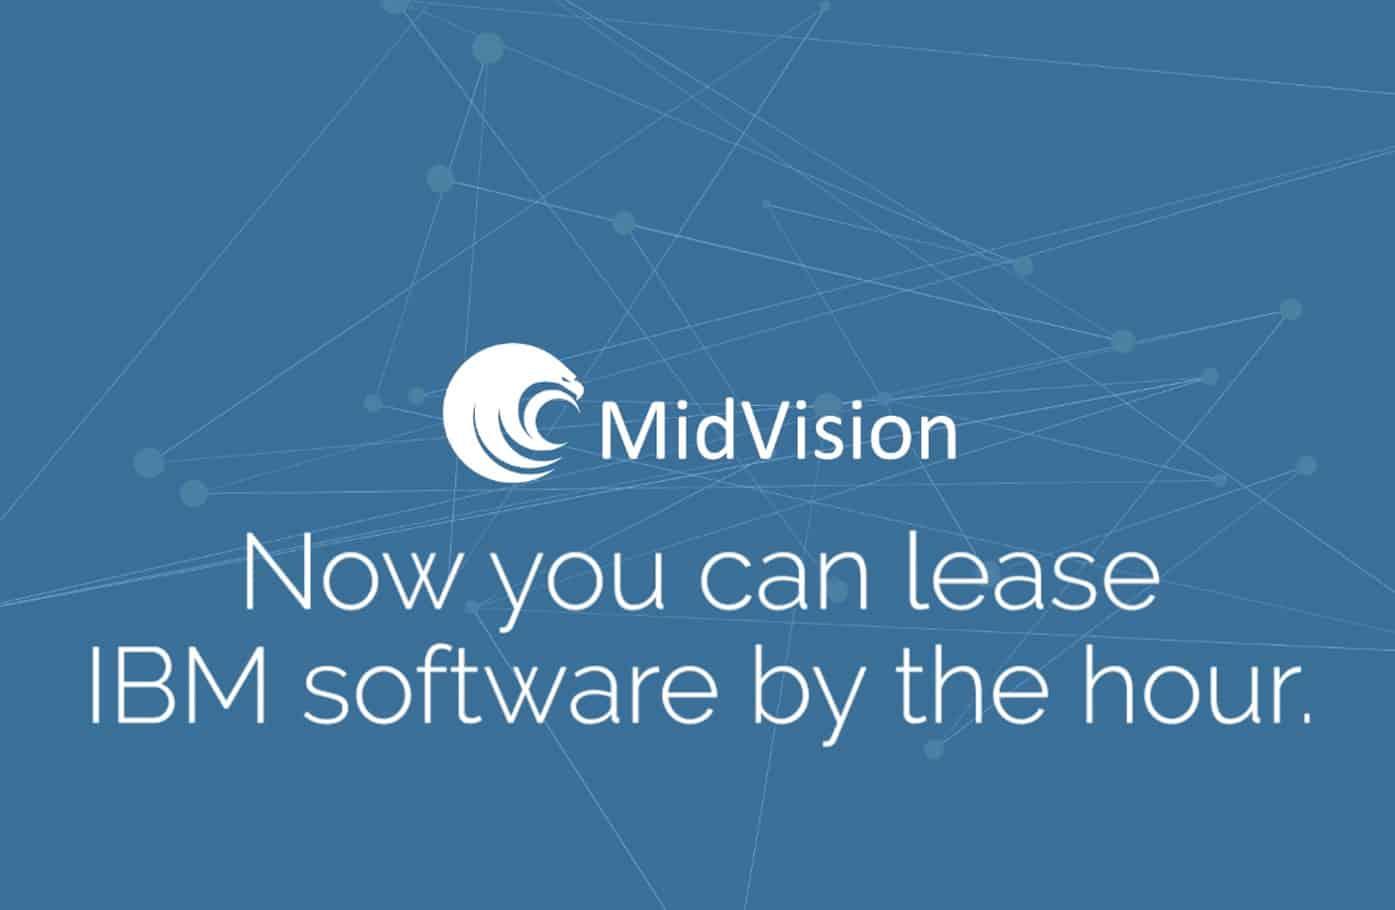 Motion Graphics 2D Animation - Midvision